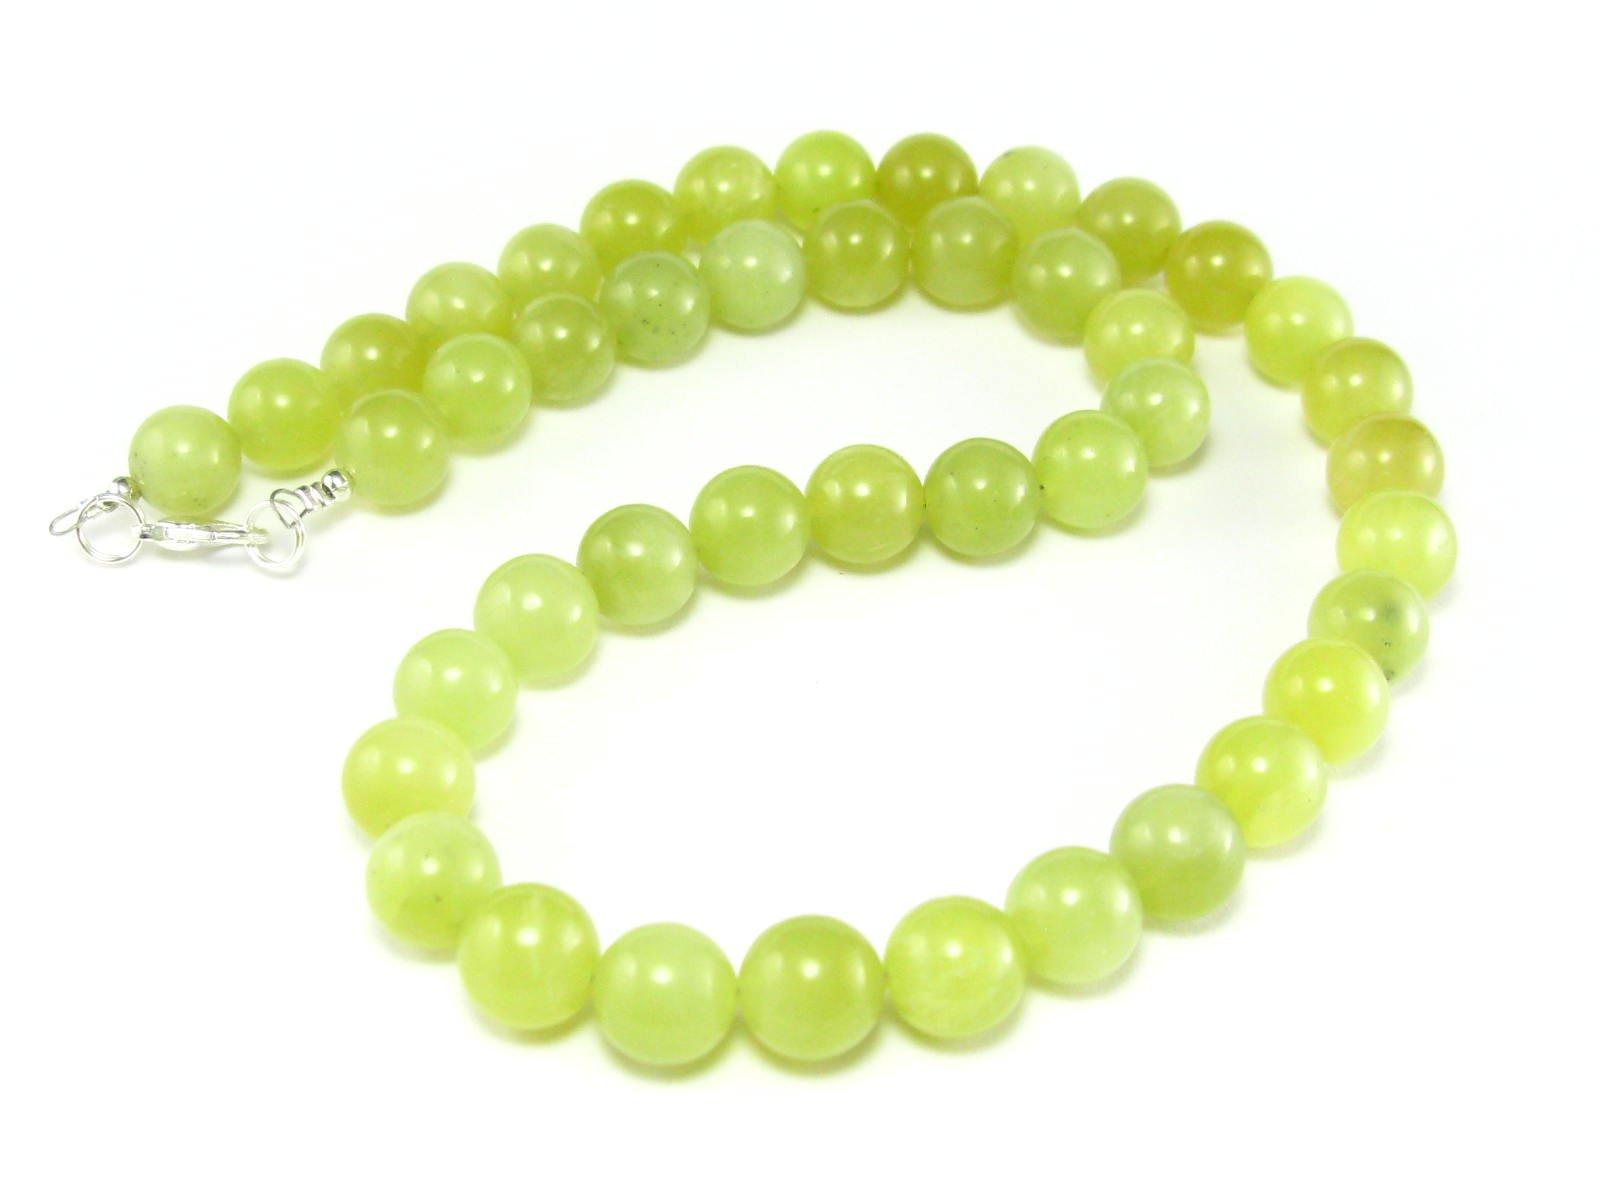 Healerite Necklace Beads - 19'' - 10mm Round Beads